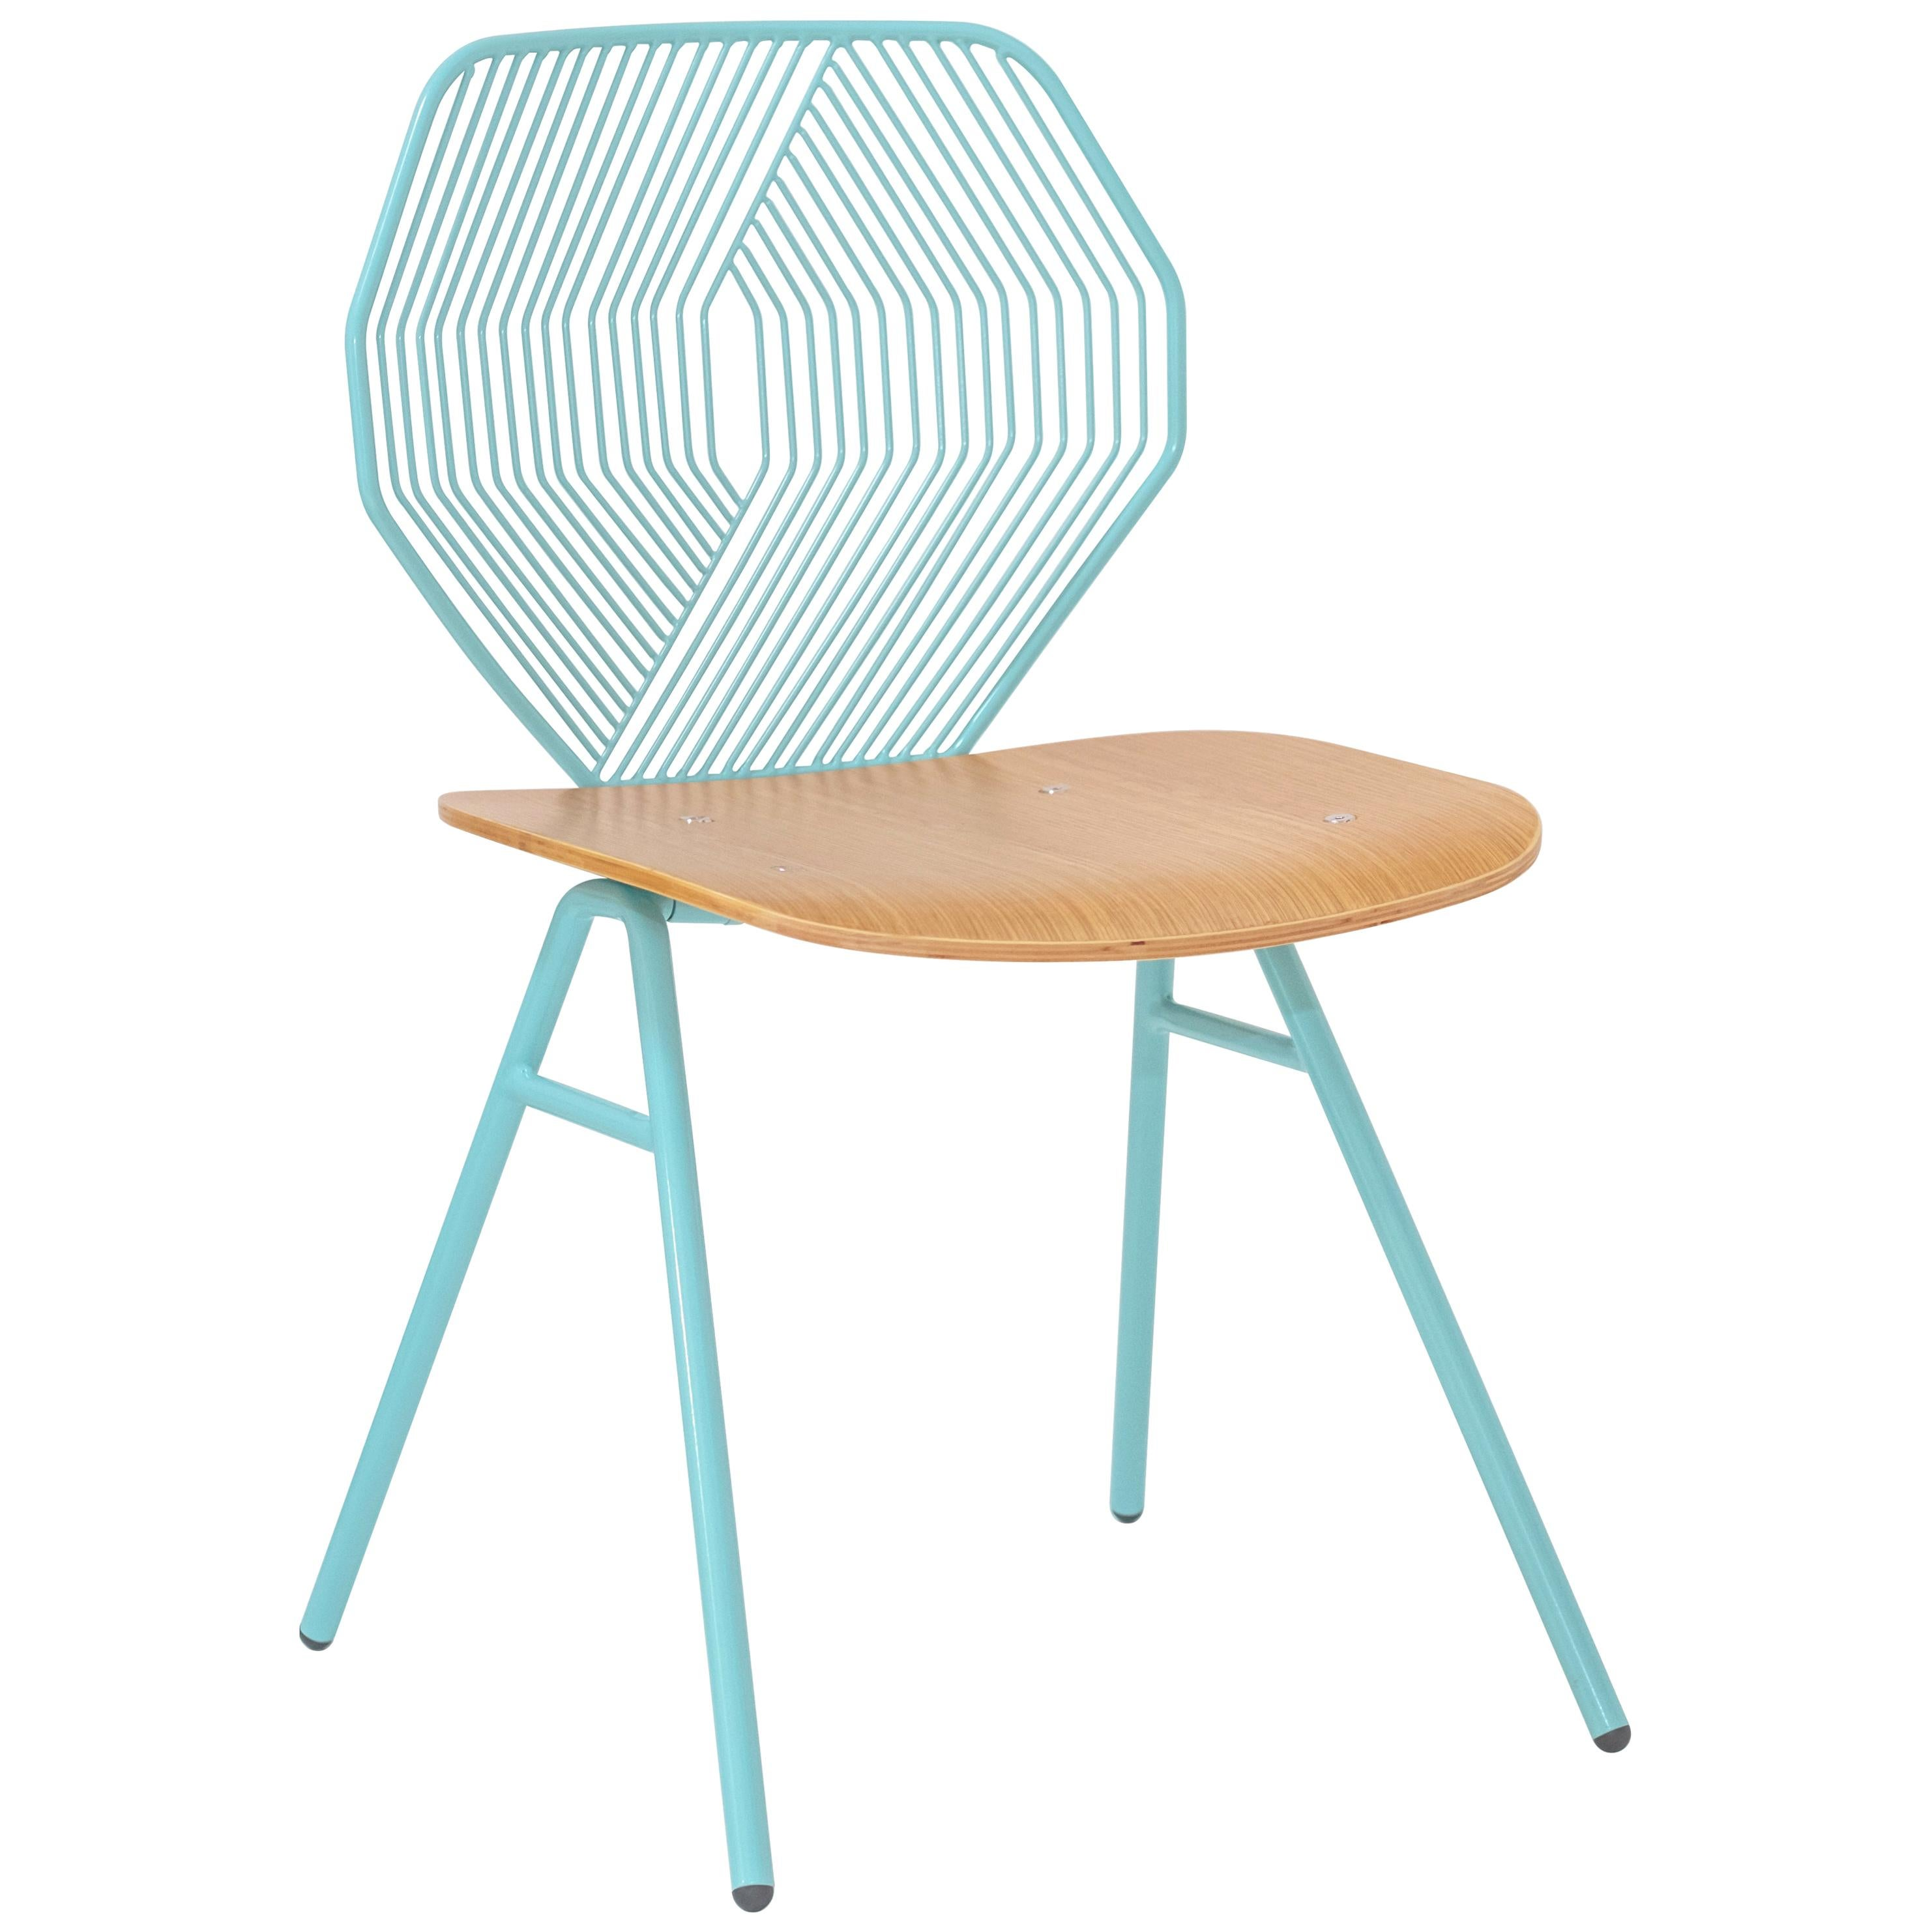 Wood Side Chair, Modern Minimalist Design in Aqua by Bend Goods